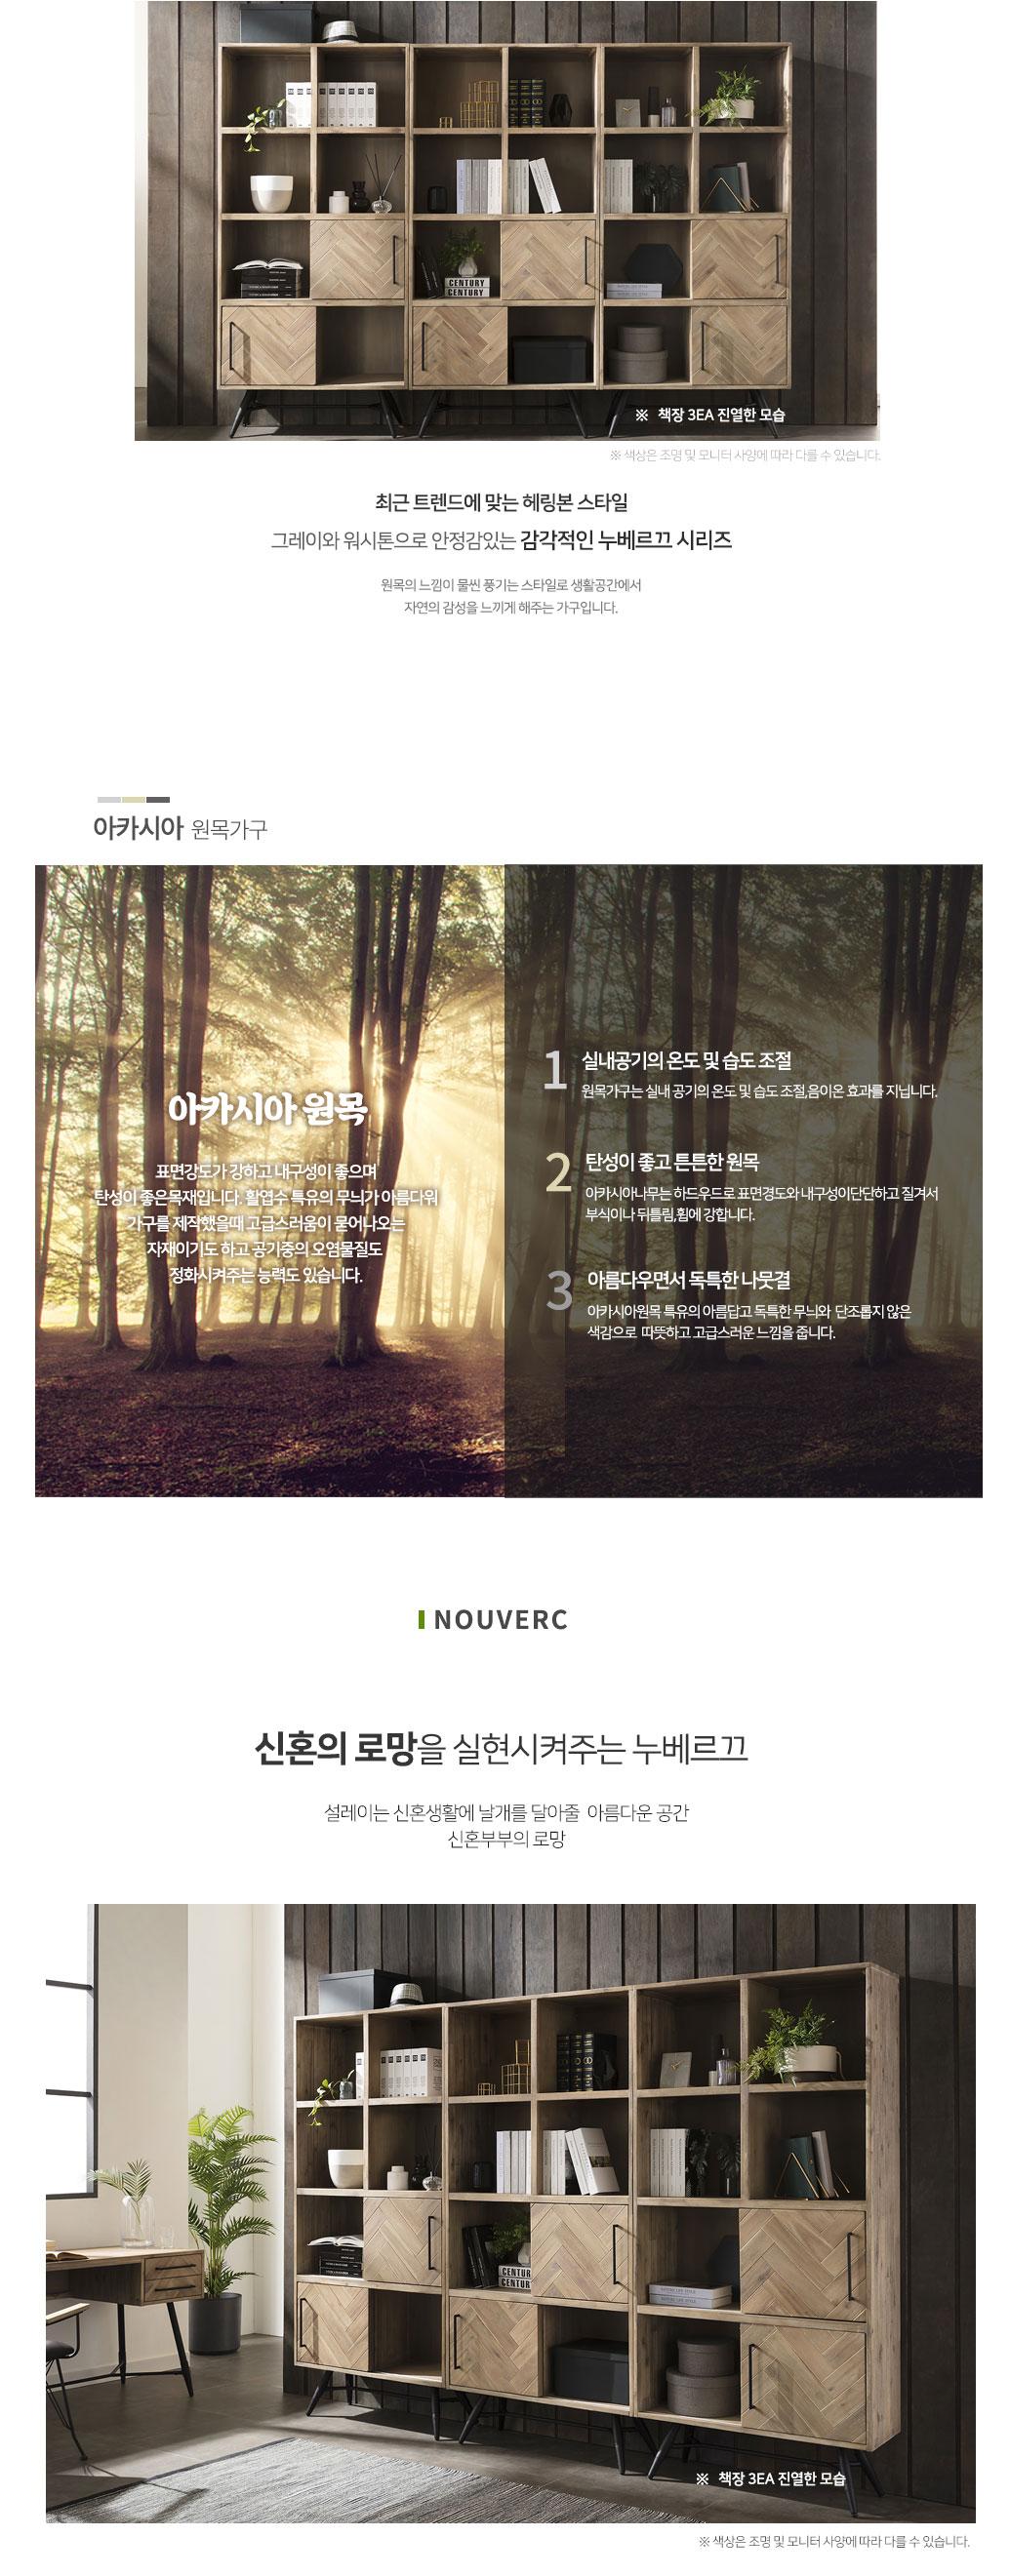 nouverc_bookcase_03.jpg